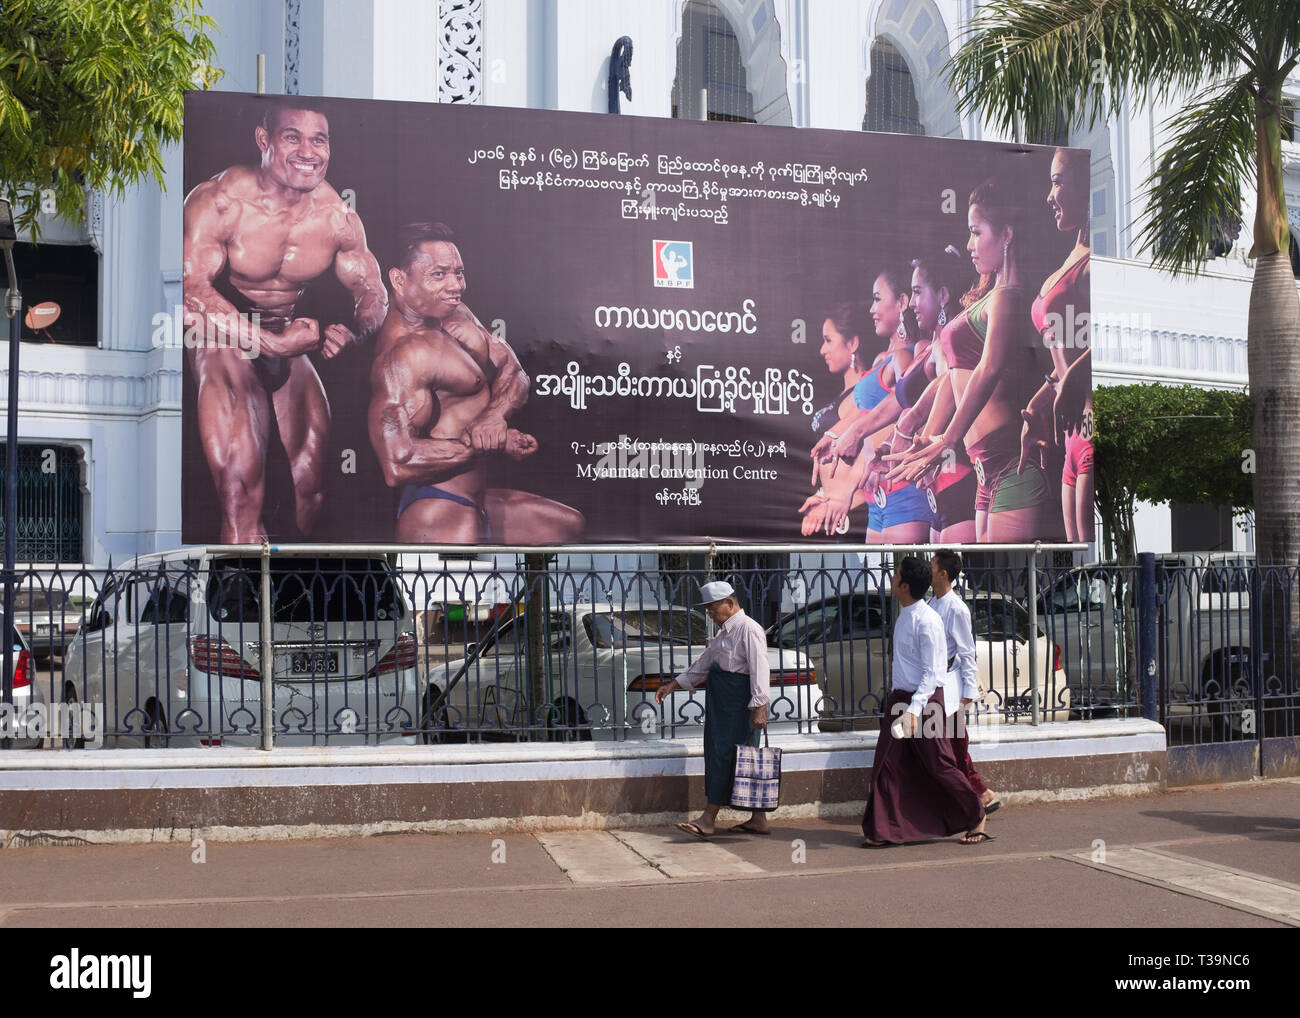 Men walking past a billboard advertising body building on Sule Pagoda Roundabout in Yangon (Rangoon), Myanmar (Burma) Stock Photo